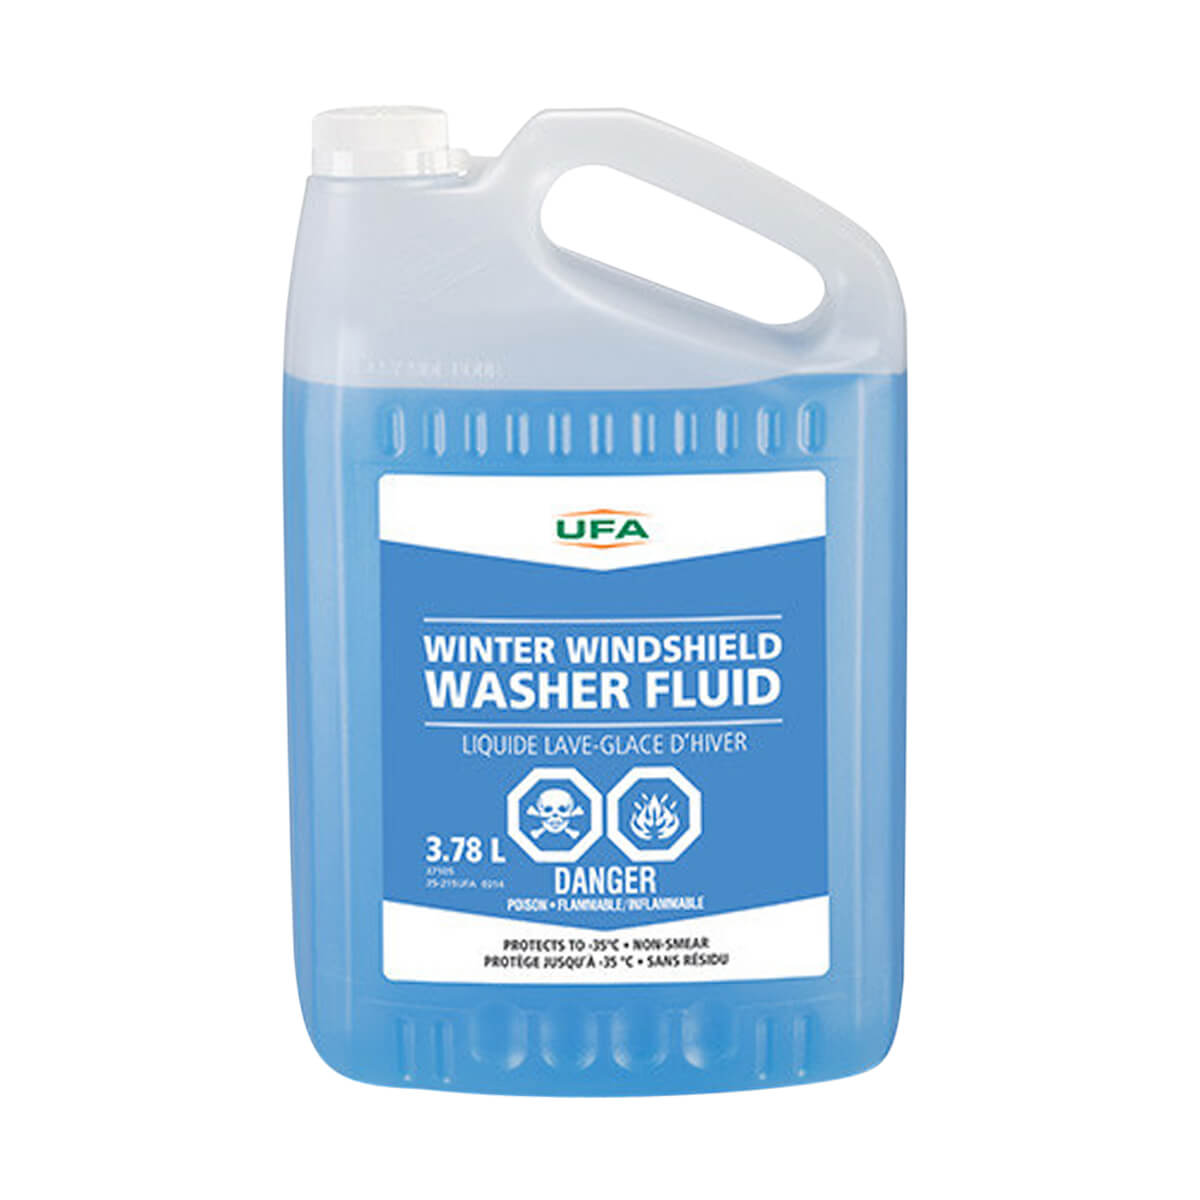 Winter Windshield Washer Fluid - 3.78 L